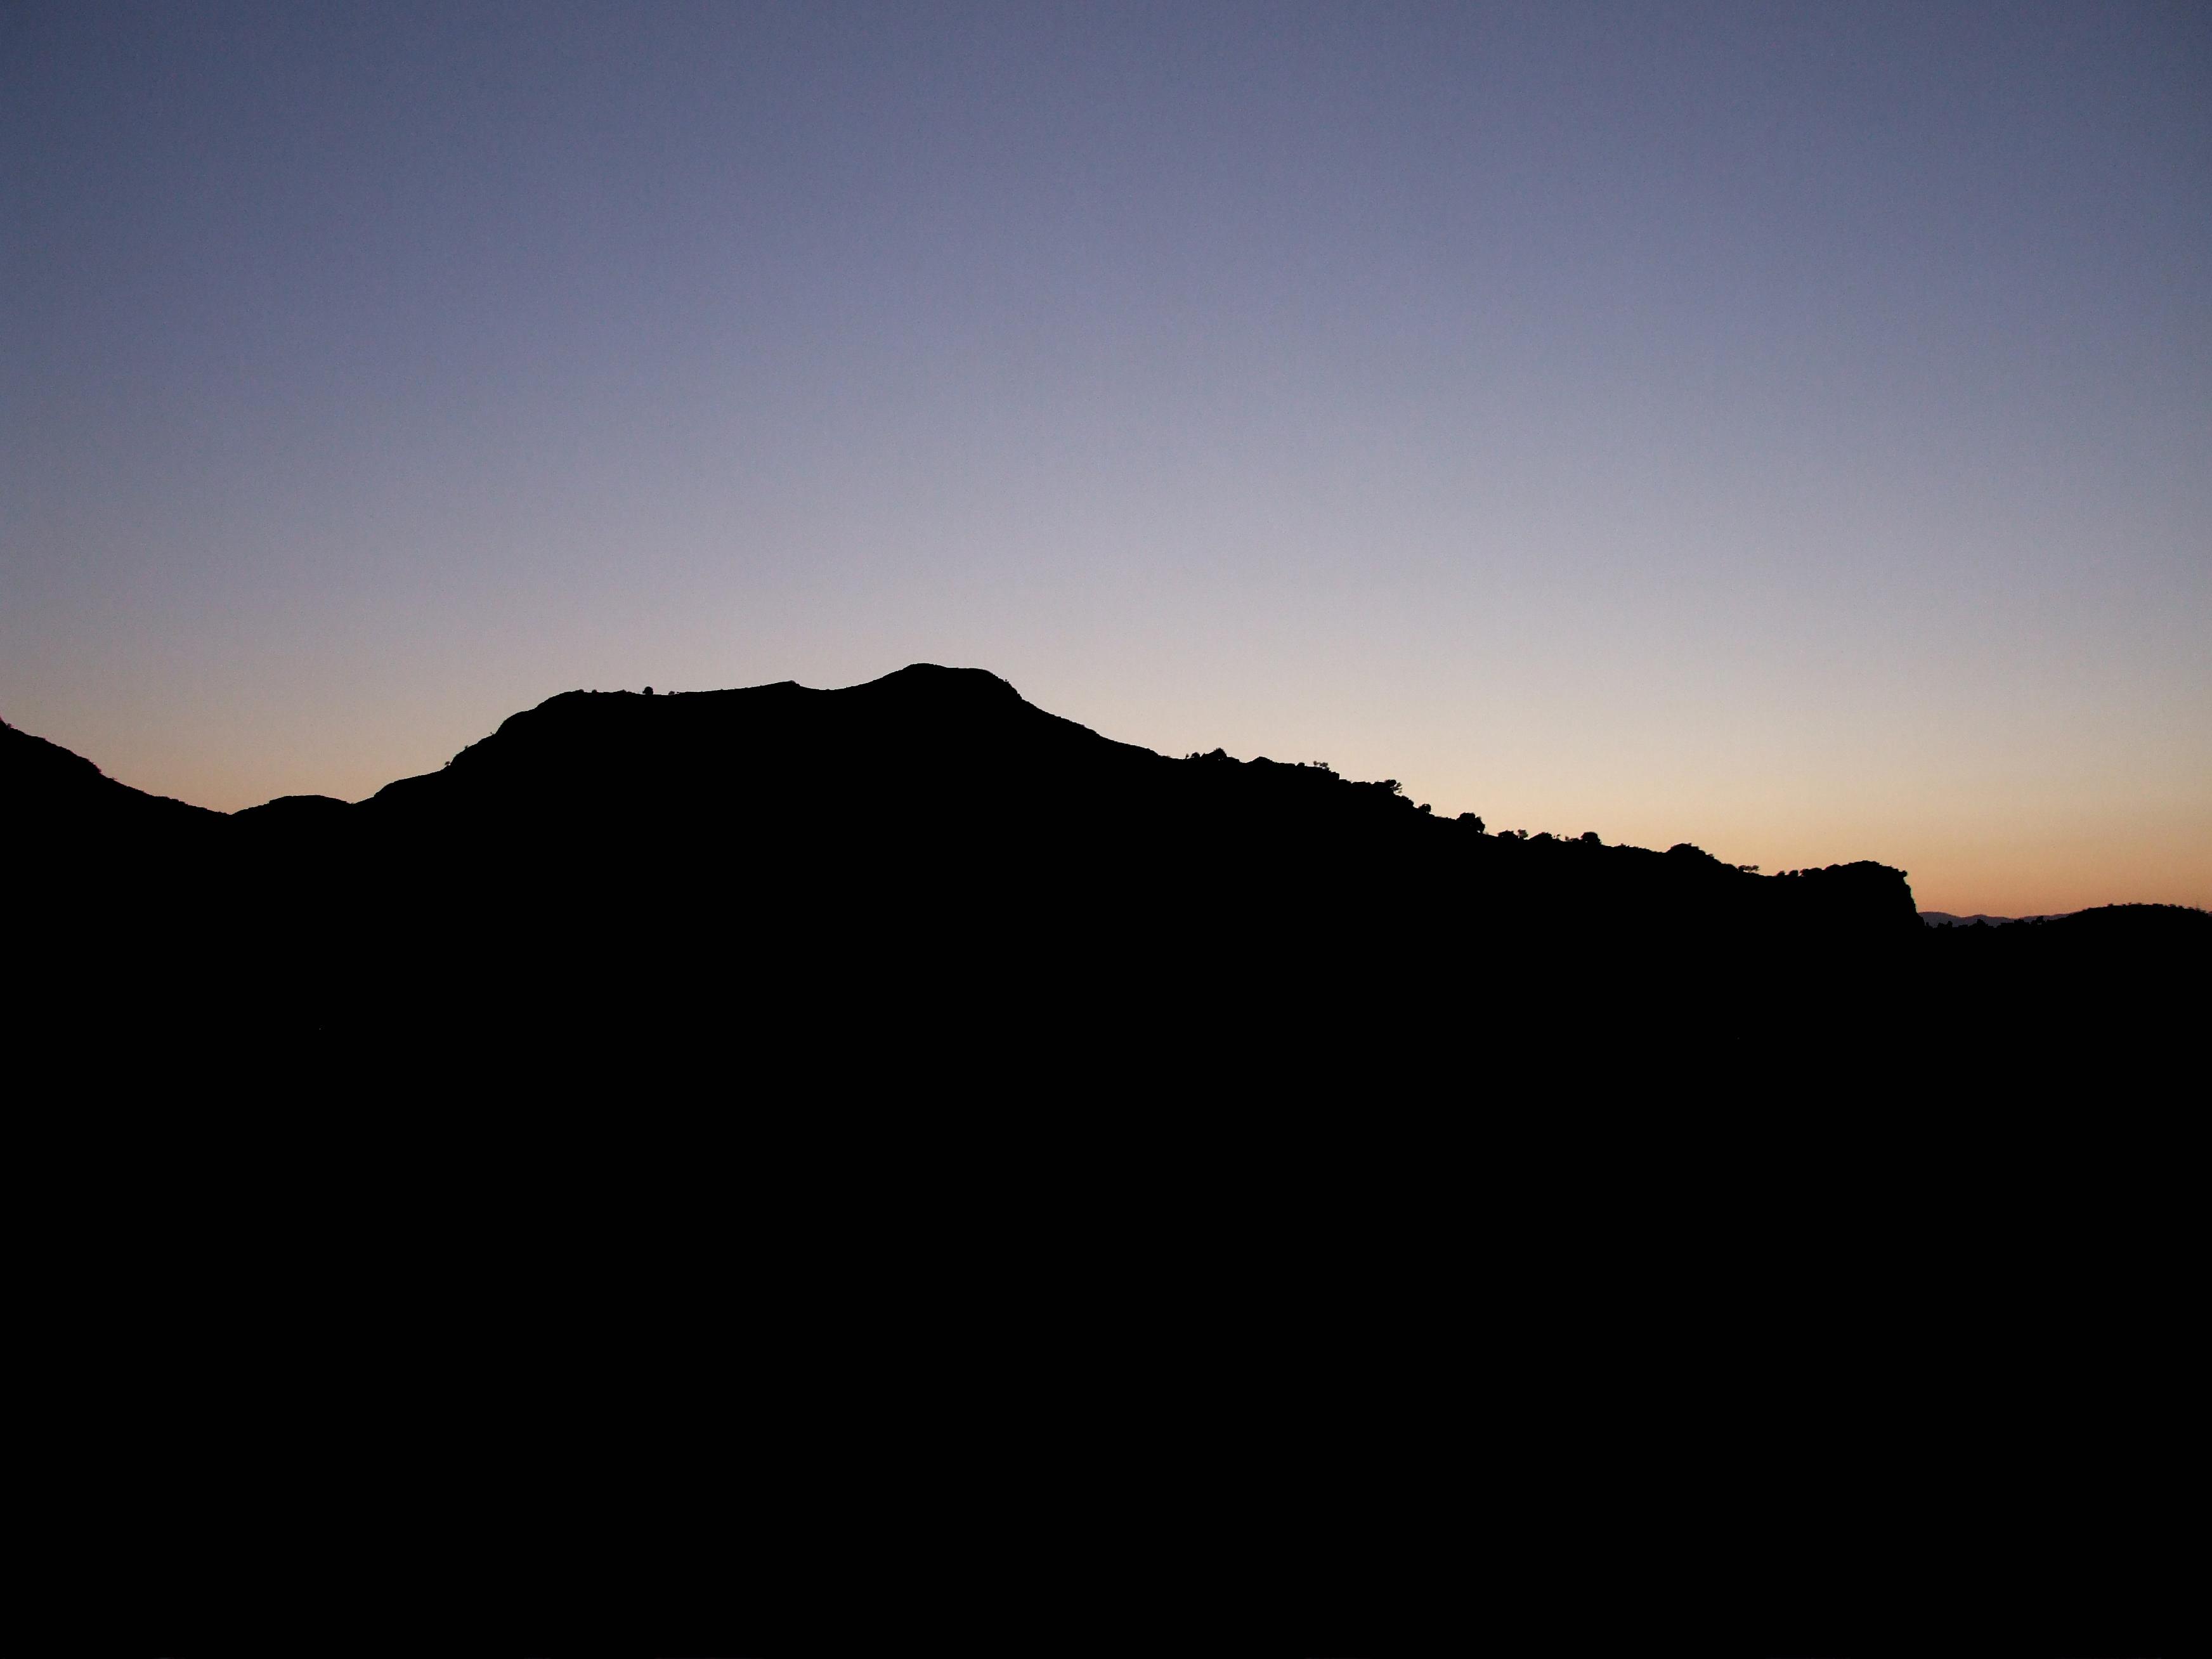 Rhodes Silhouette